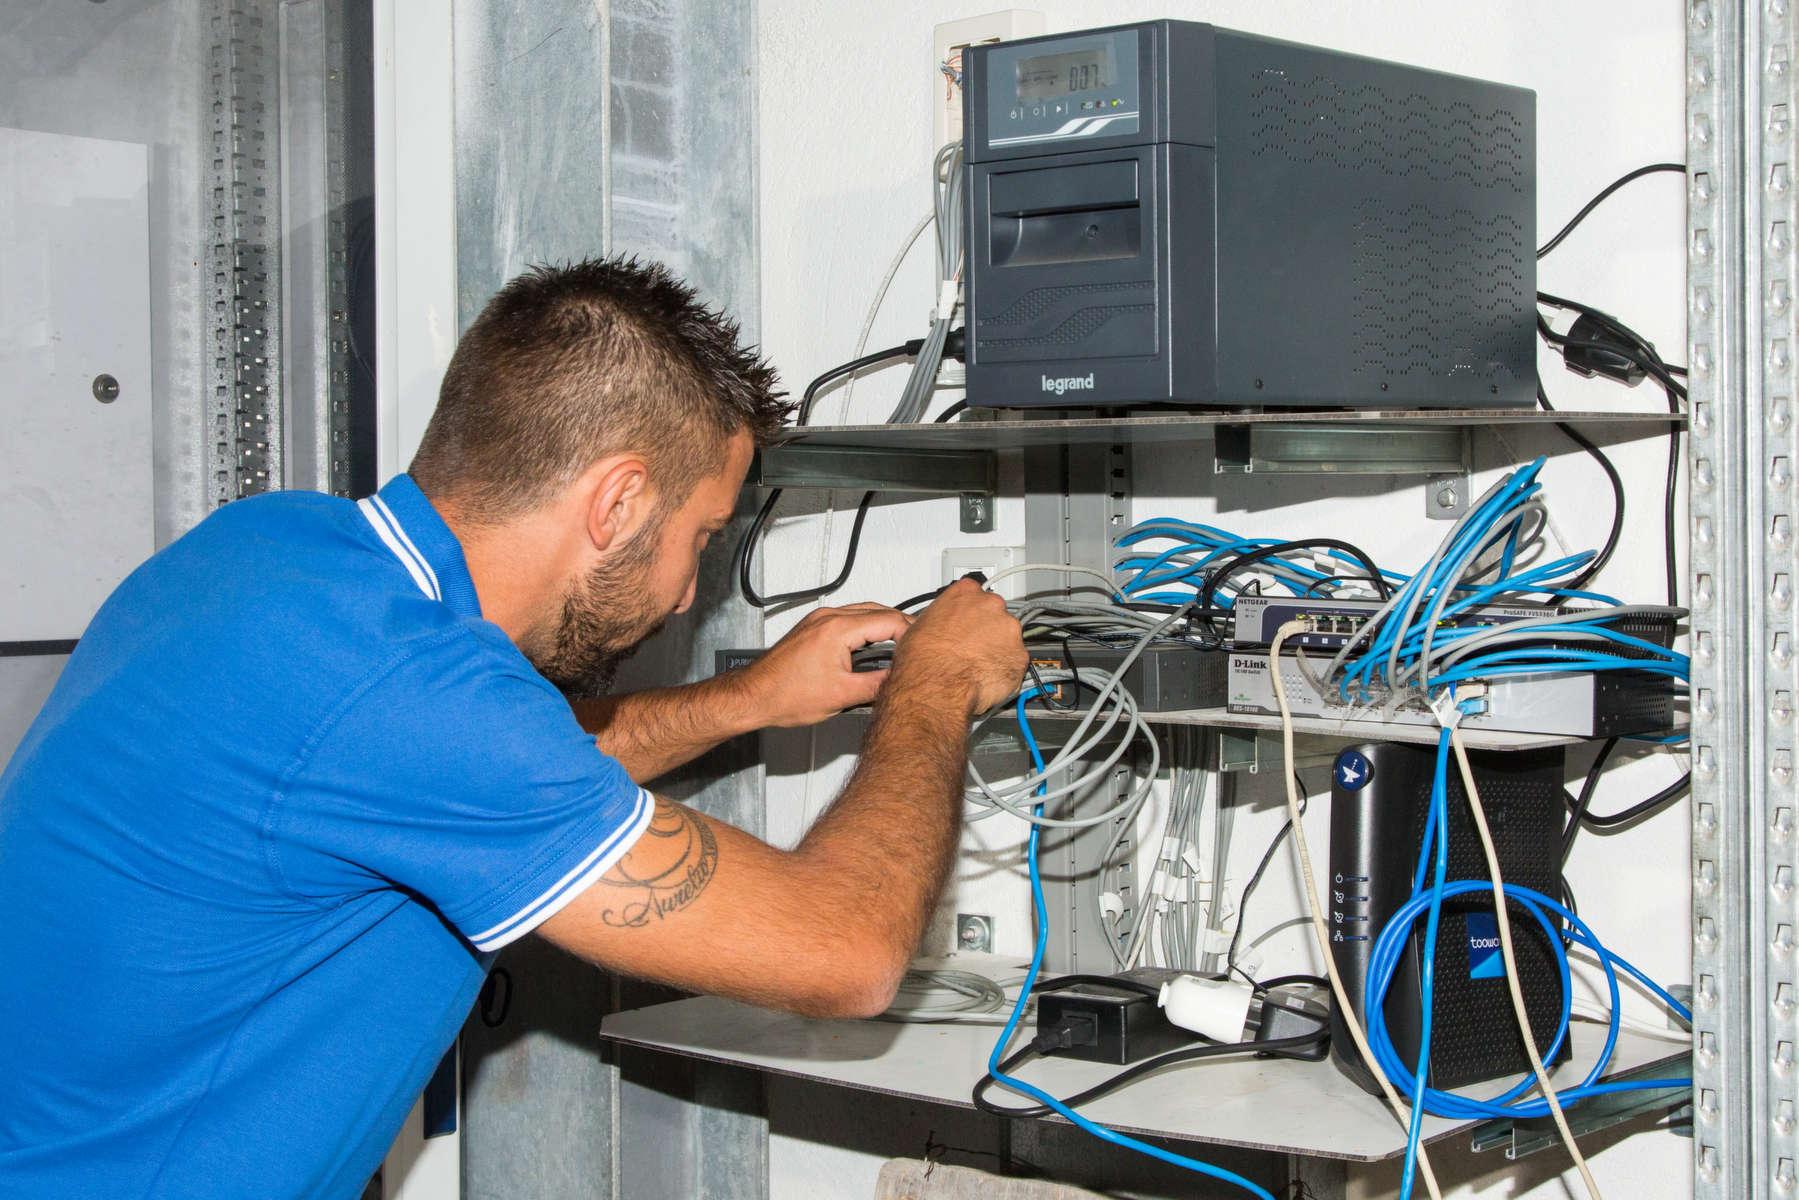 installazione modem